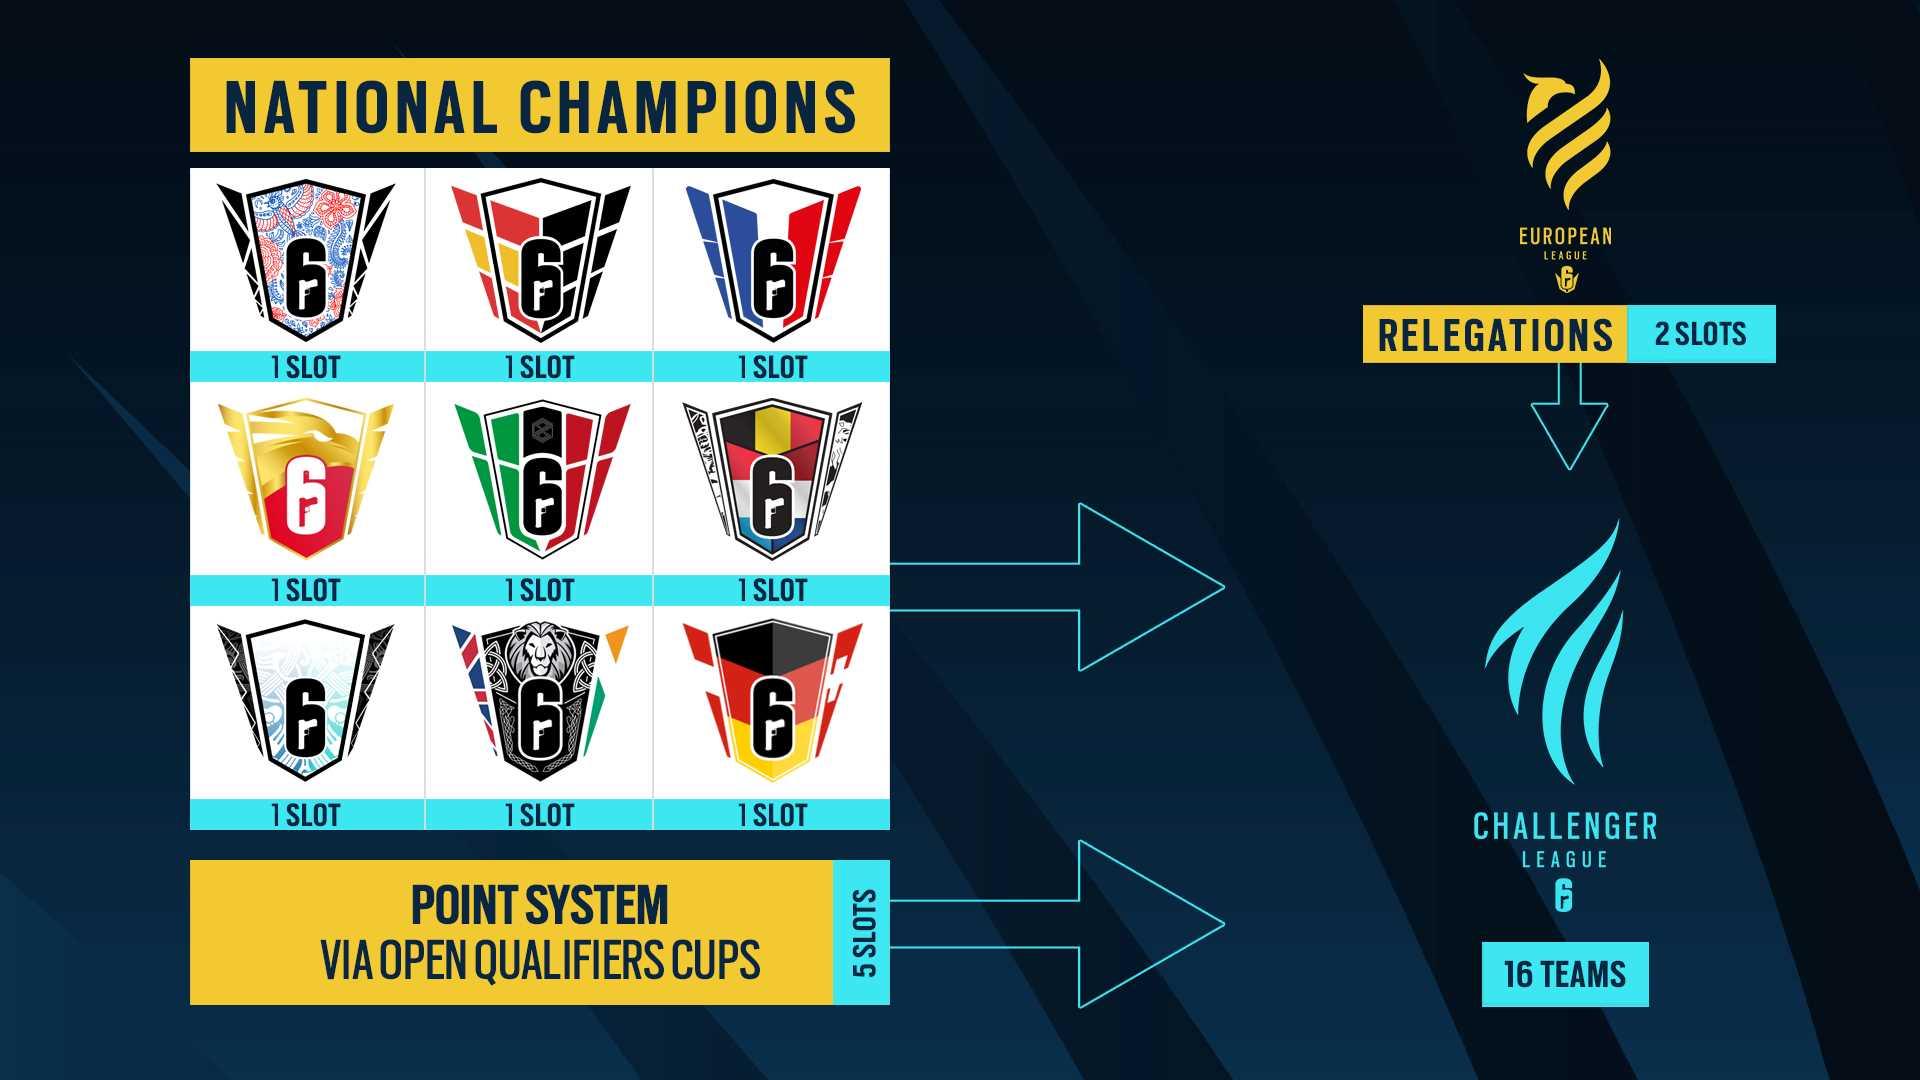 Rainbow Six European Challenger League Qualifier - Path to Challenger League